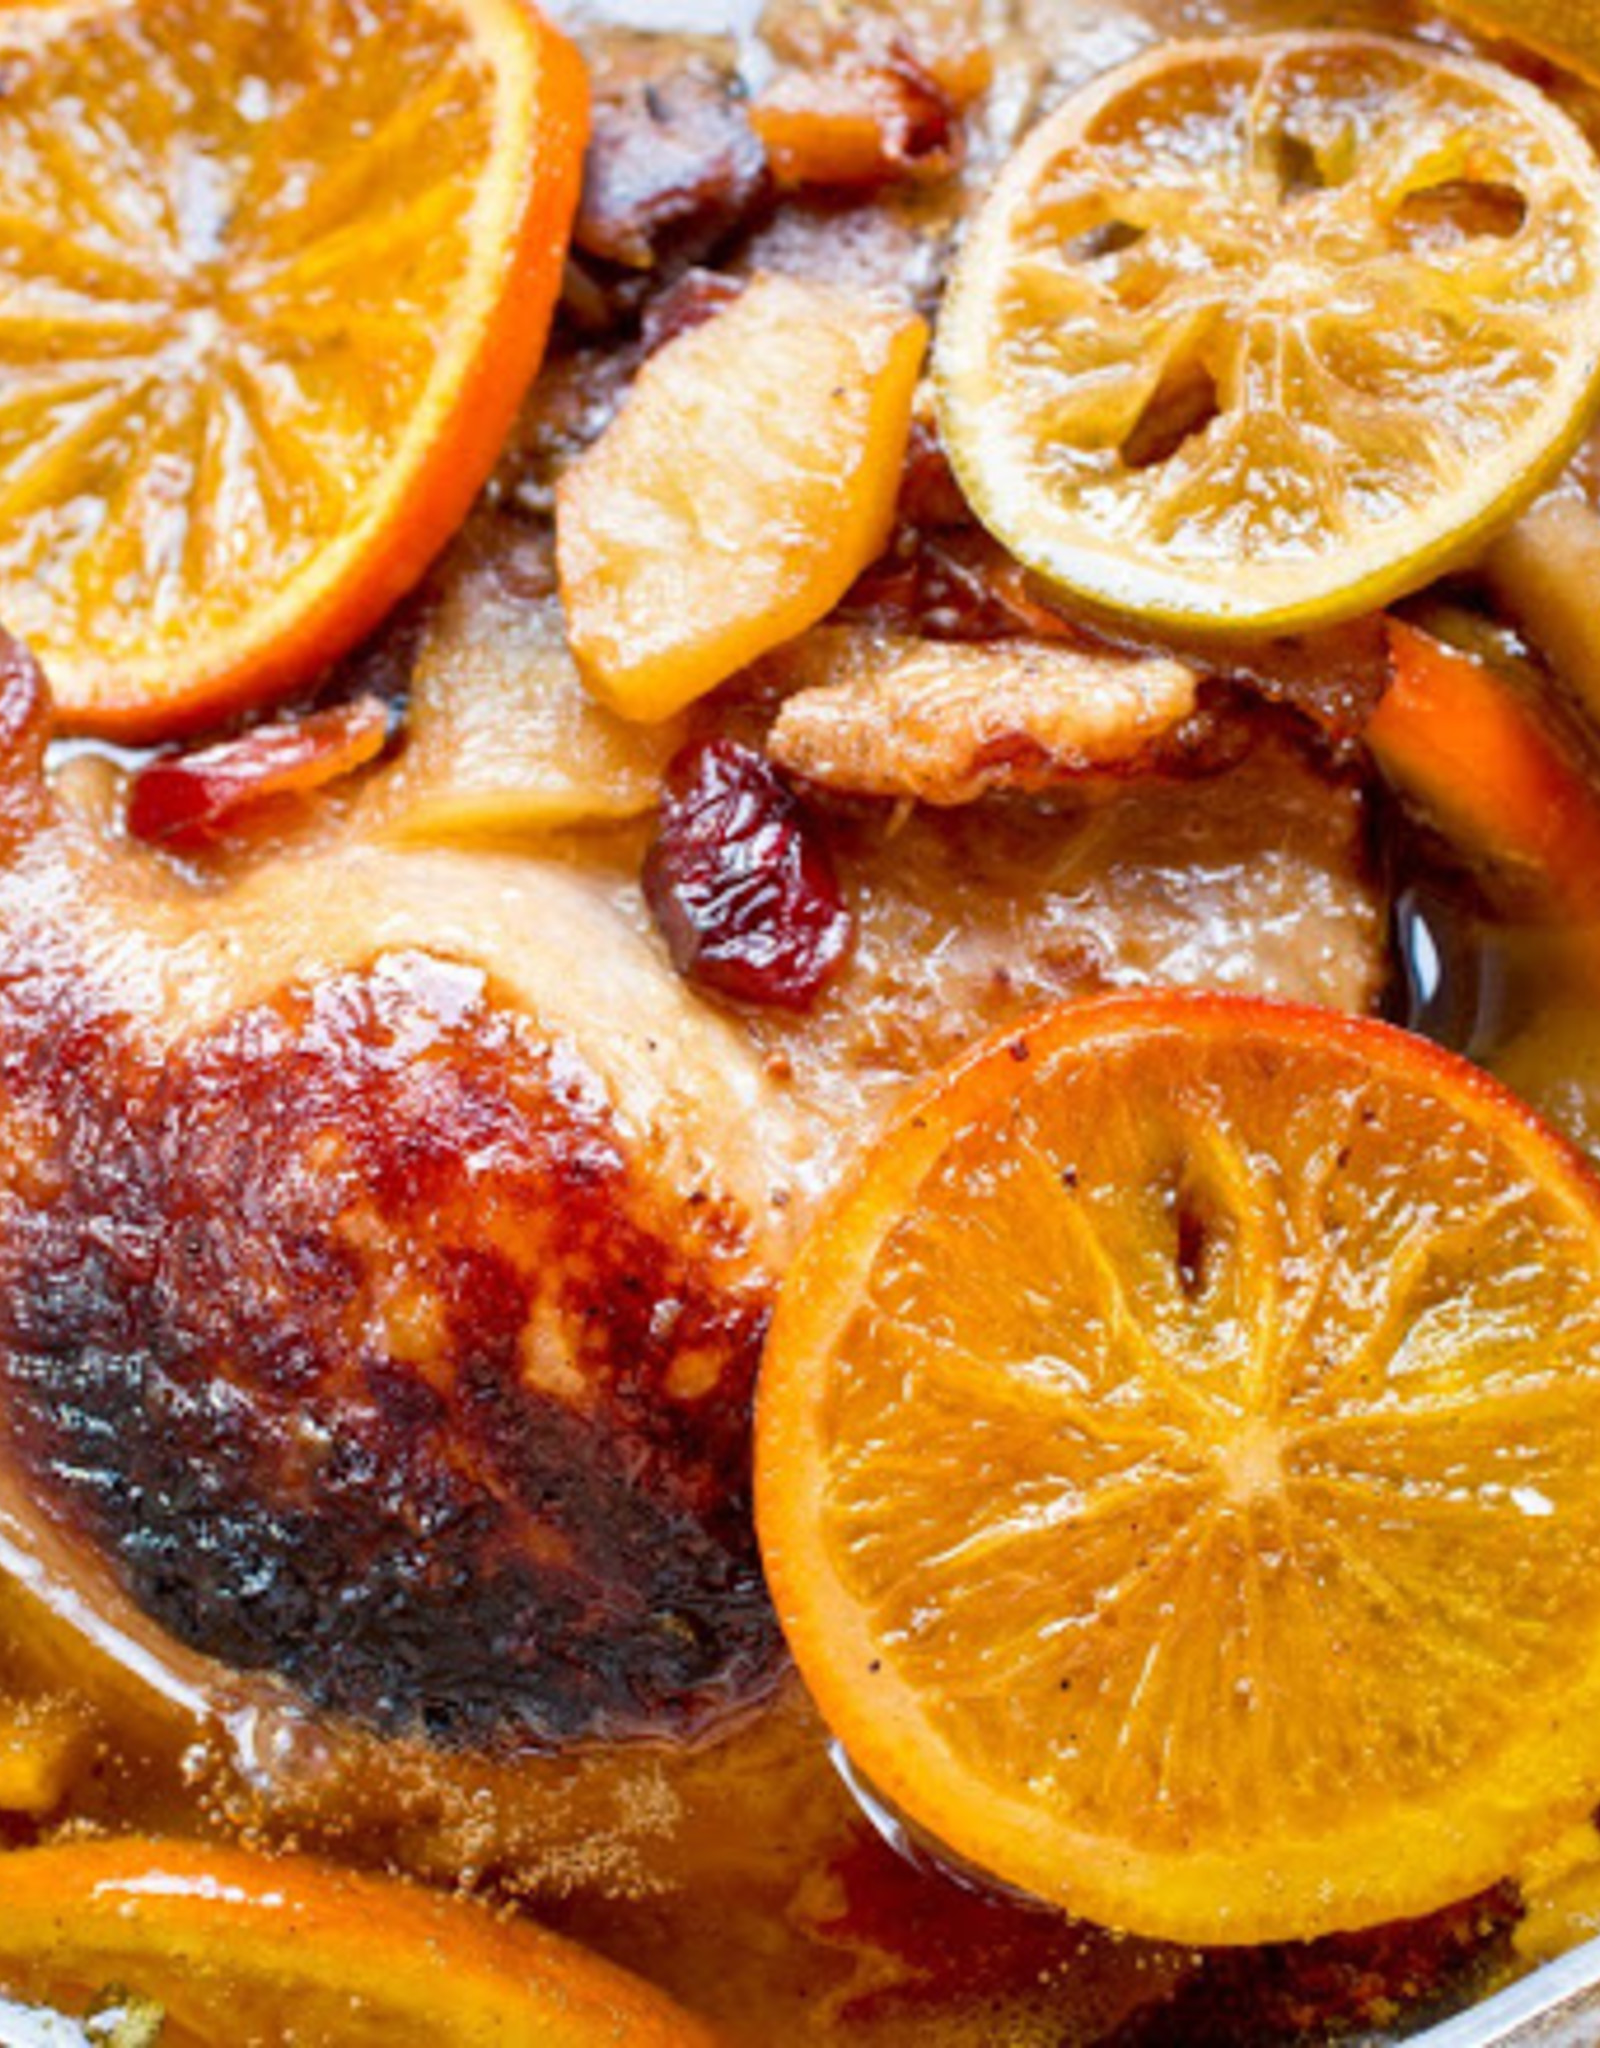 sinaasappel saus ( a l'orange ) 160 gr